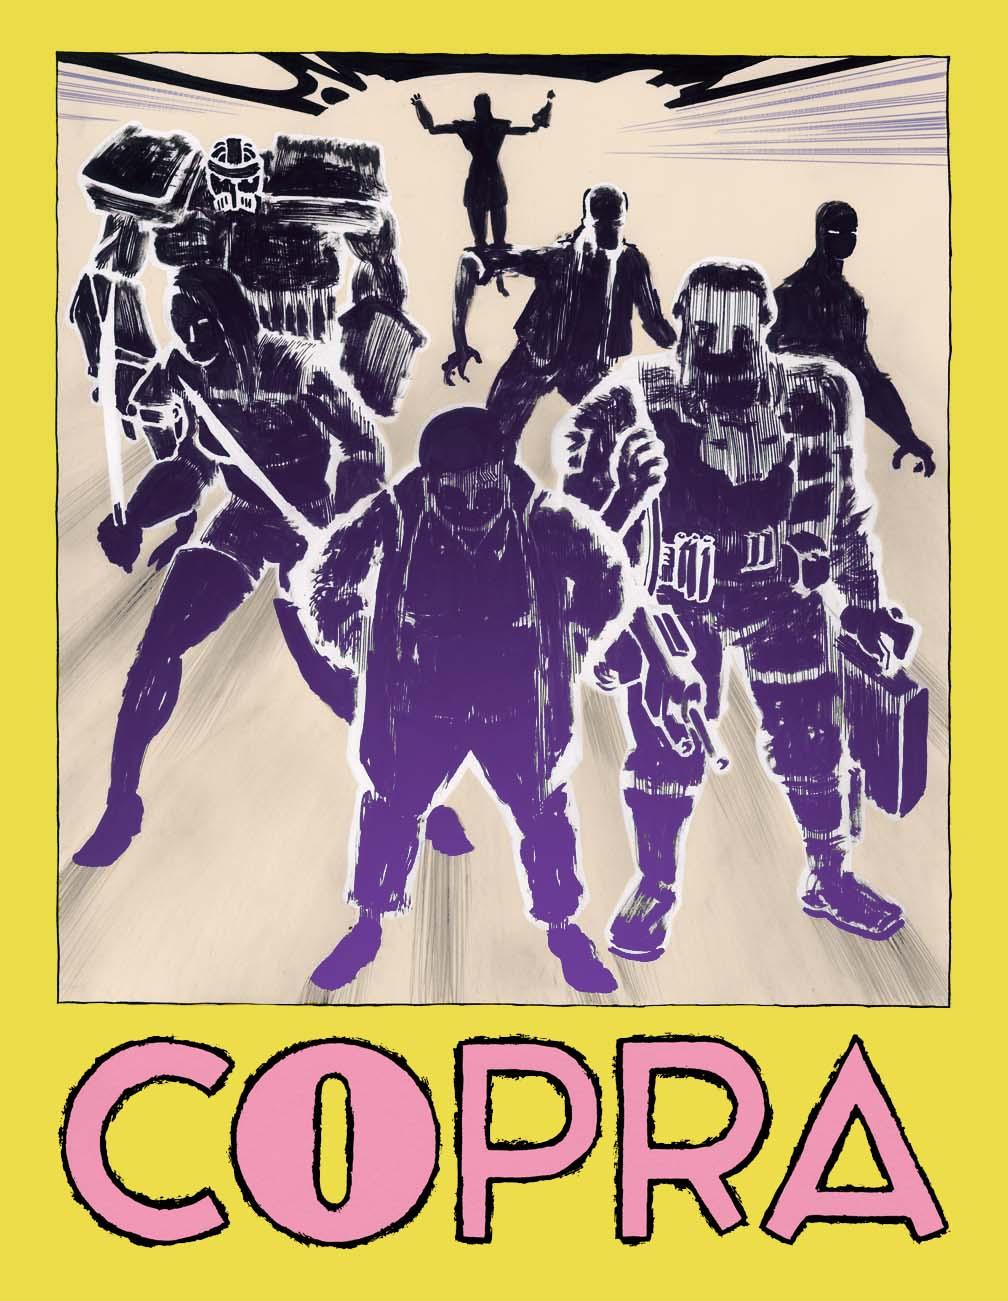 copra-team